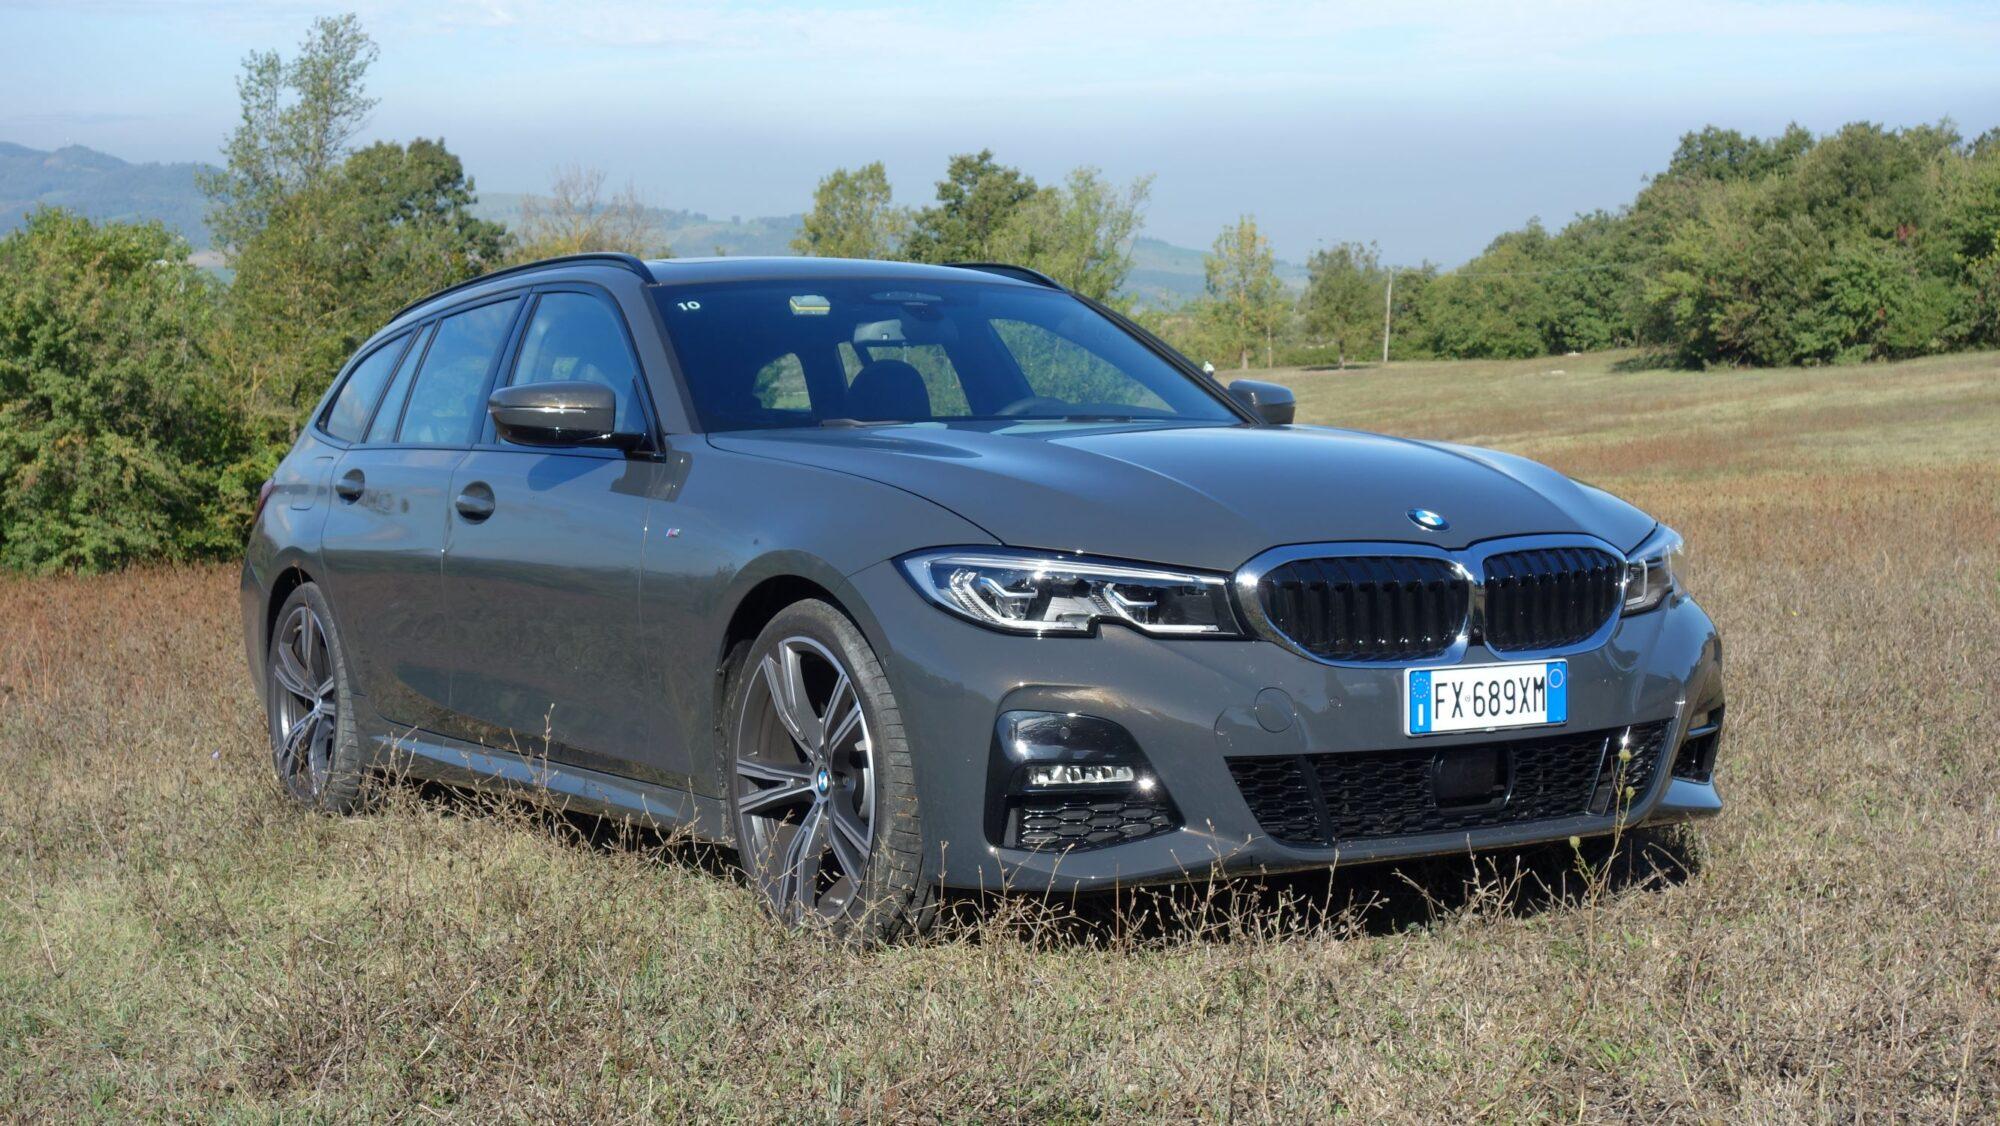 BMW Serie 3 Touring test drive: l'icona della Casa bavarese si rinnova thumbnail